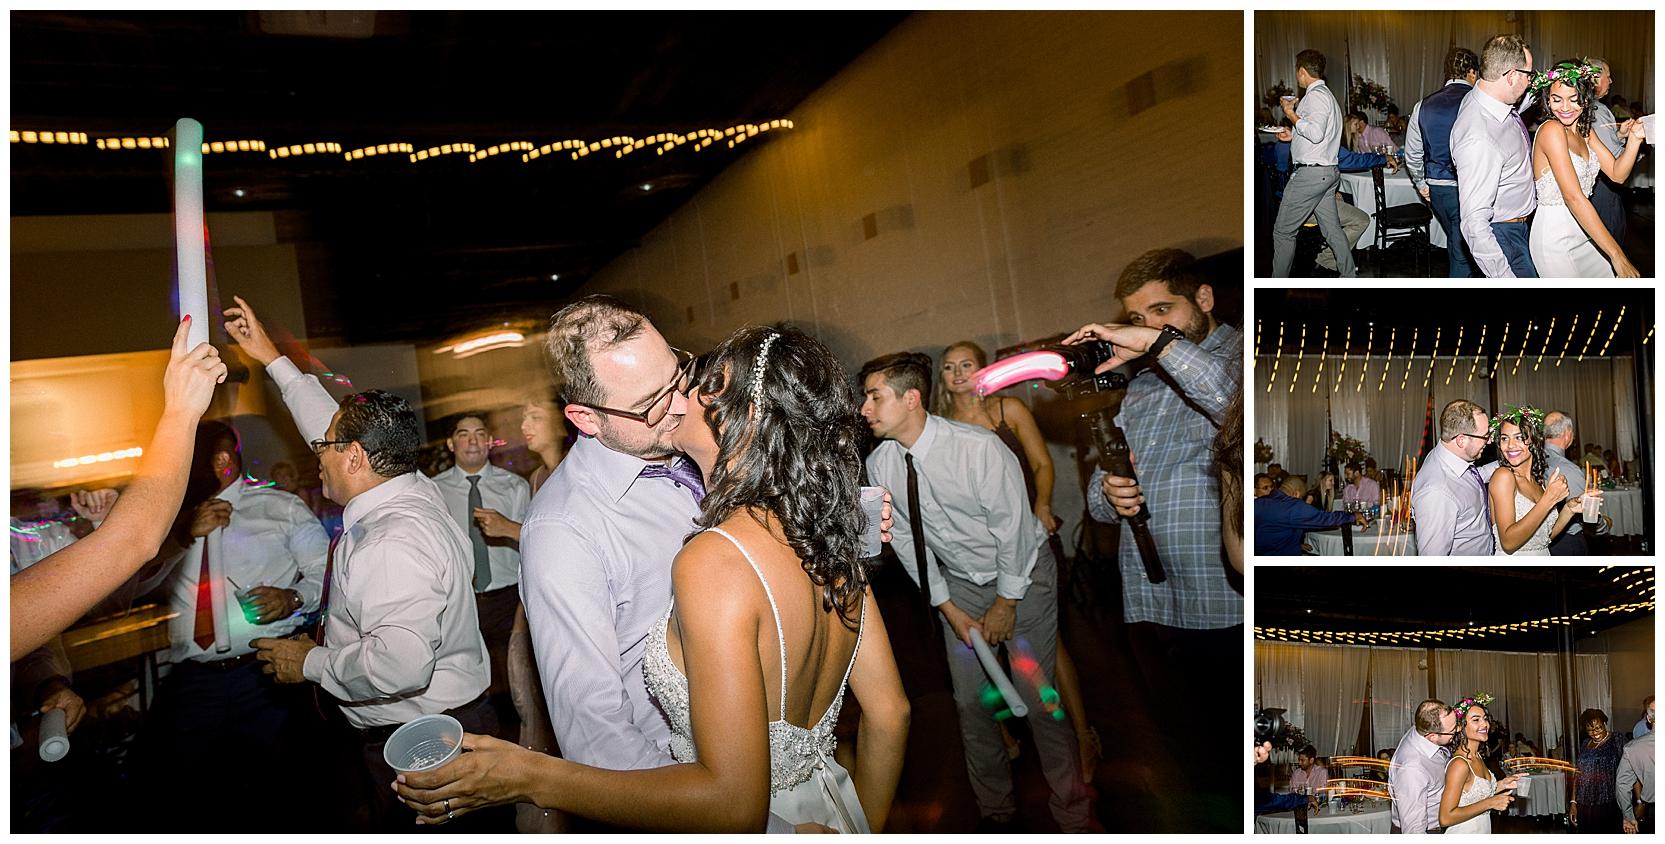 jessicafredericks_lakeland_tampa_wedding_purple_crazy hour_0098.jpg